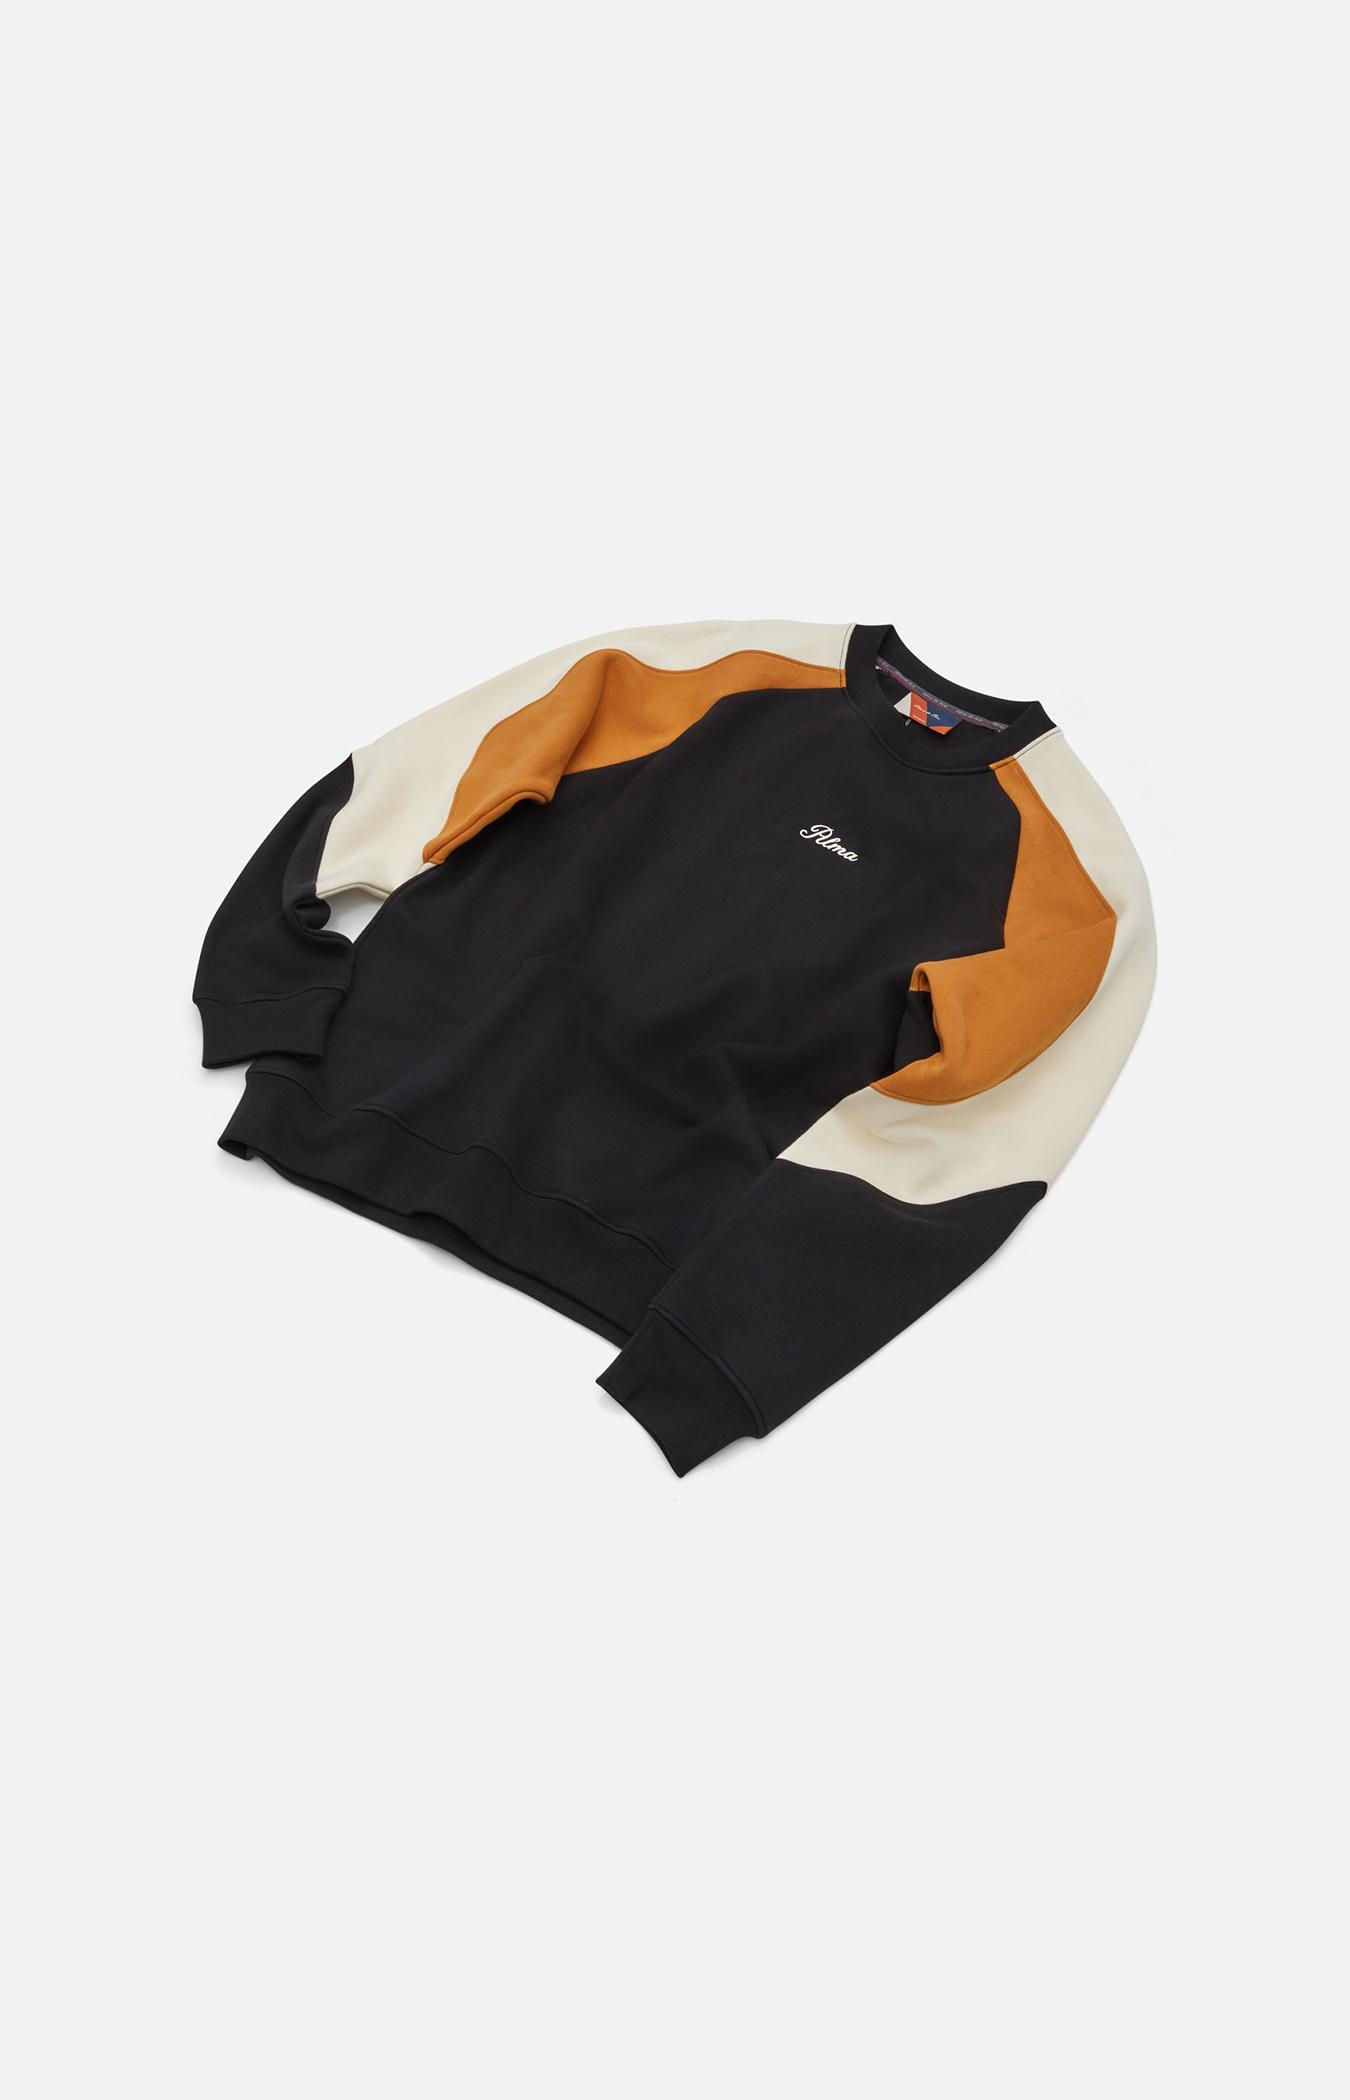 Black / Mustard  Parvis Sweatshirt